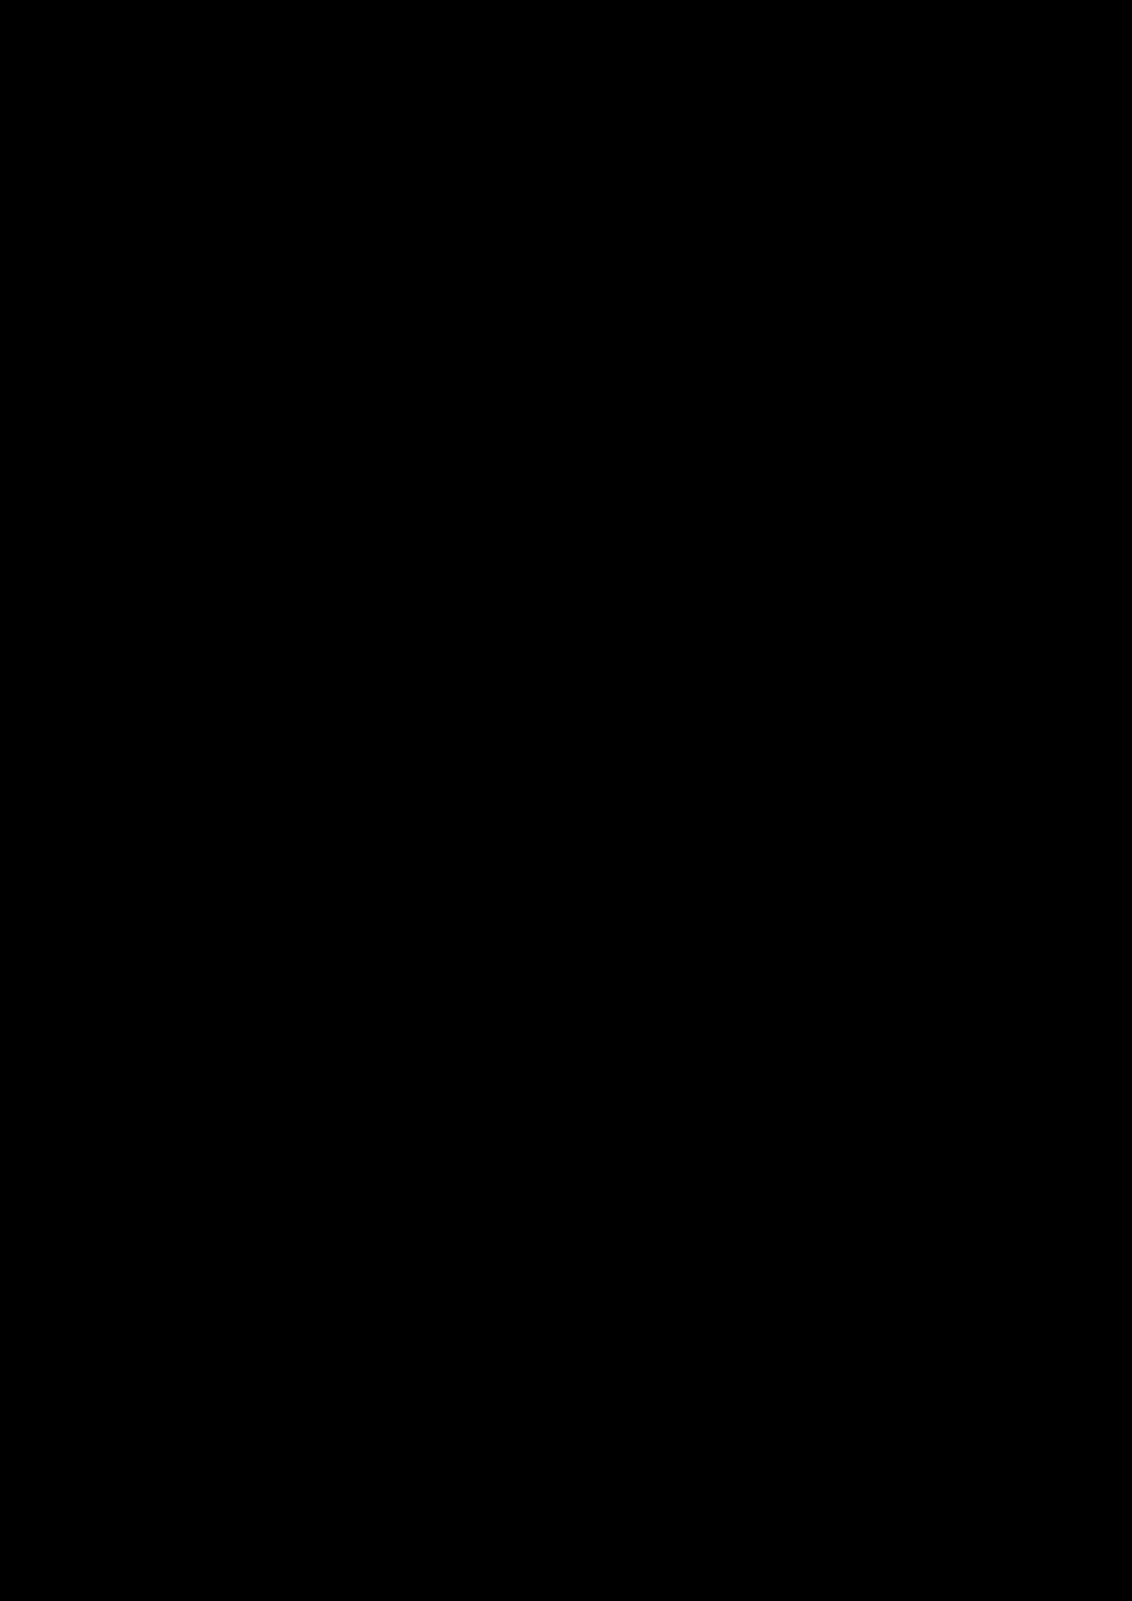 Ispoved Pervogo Boga slide, Image 8